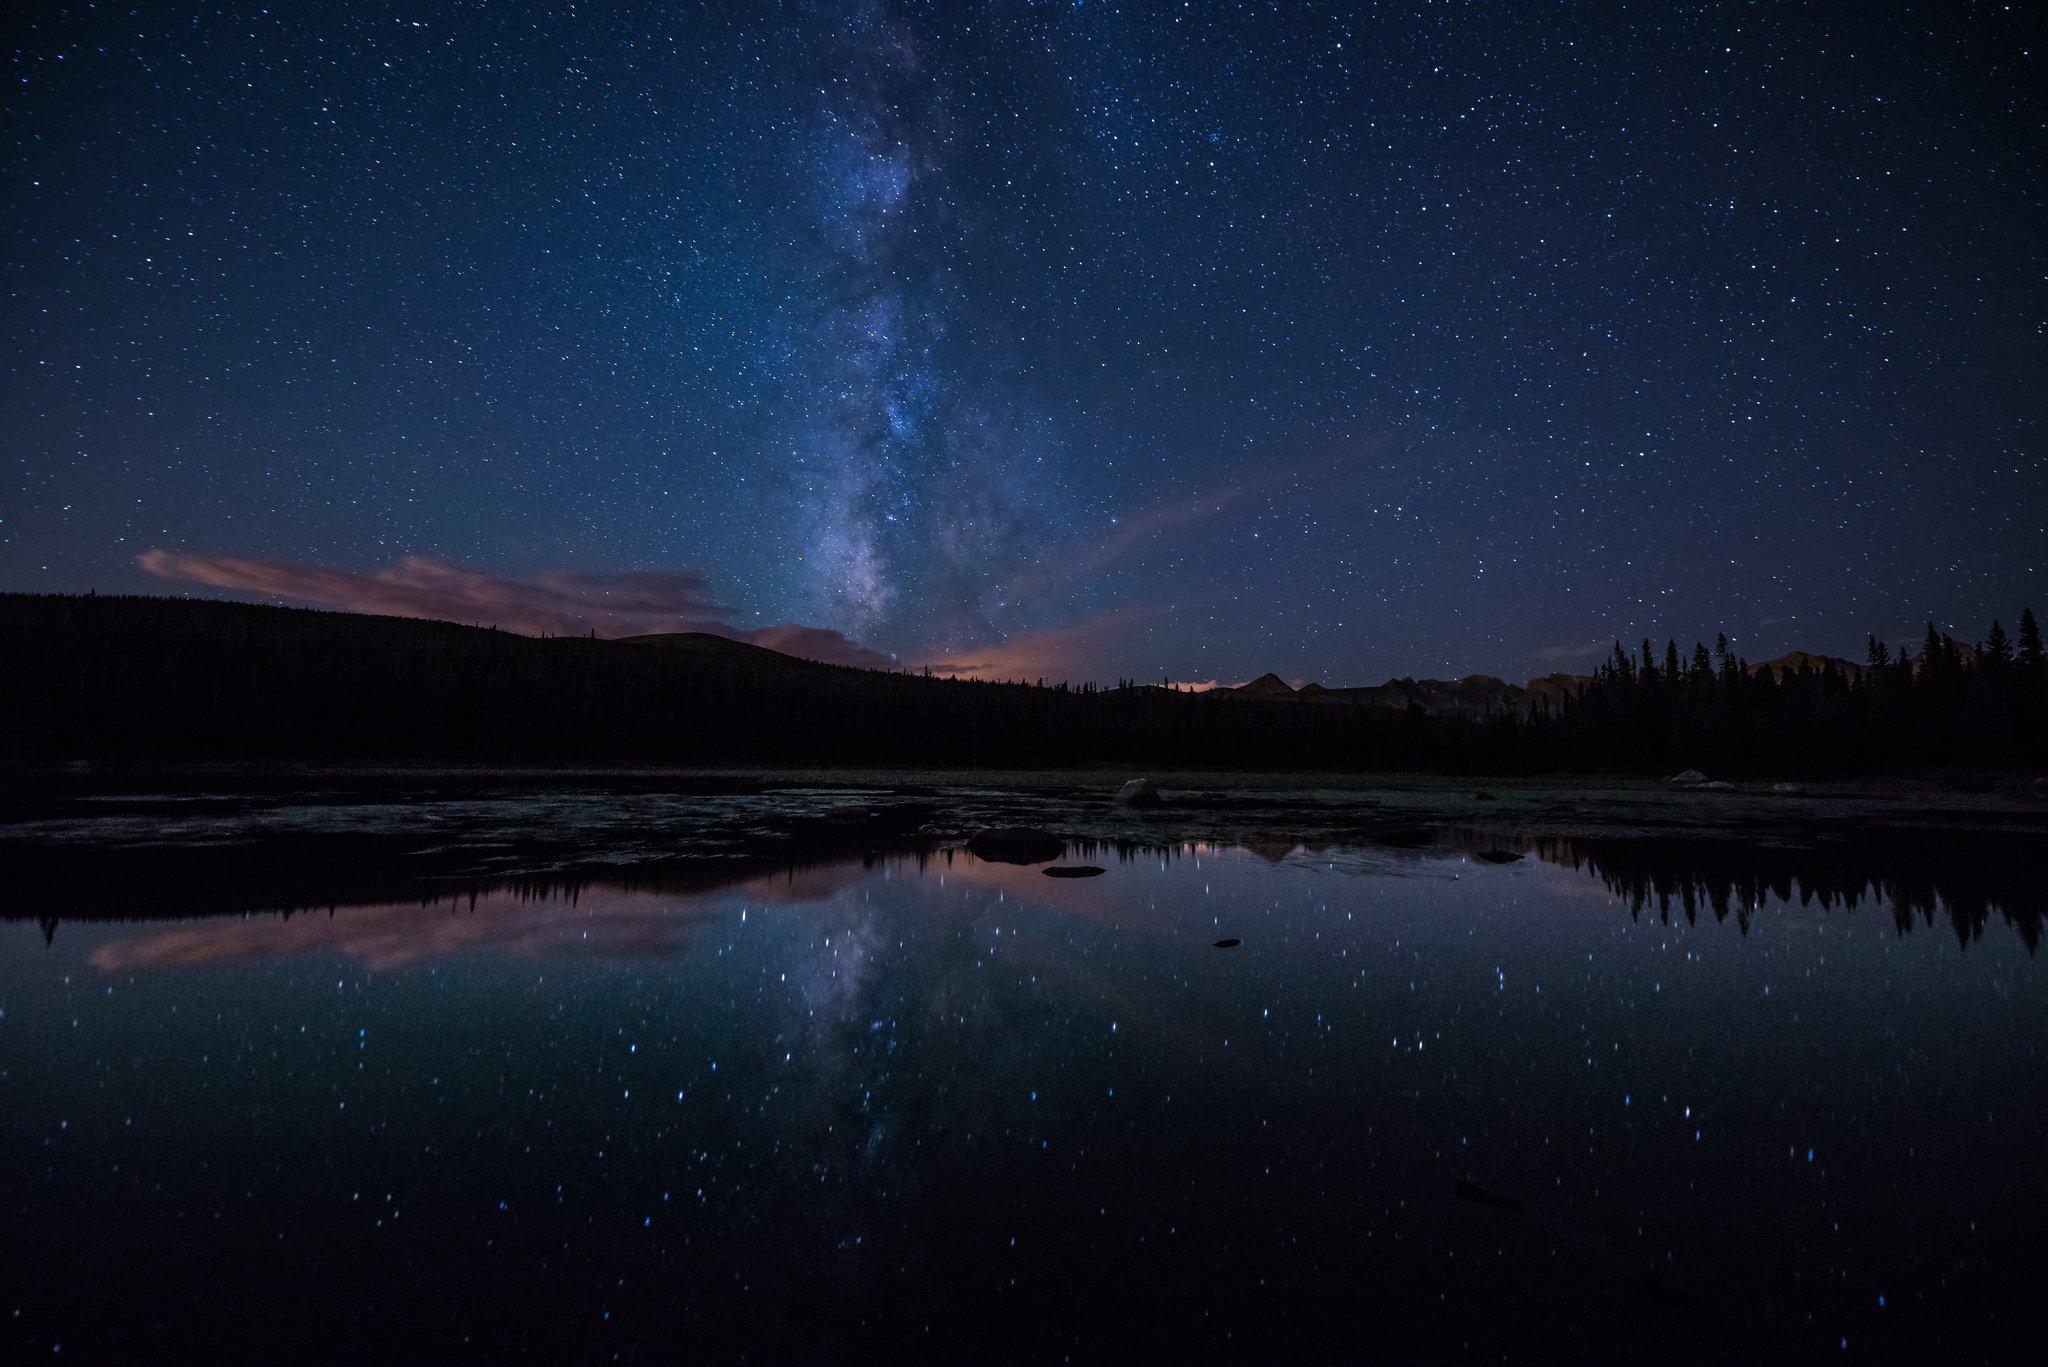 Milky Way Stars Forest Lake Night Wallpaper 2048x1367